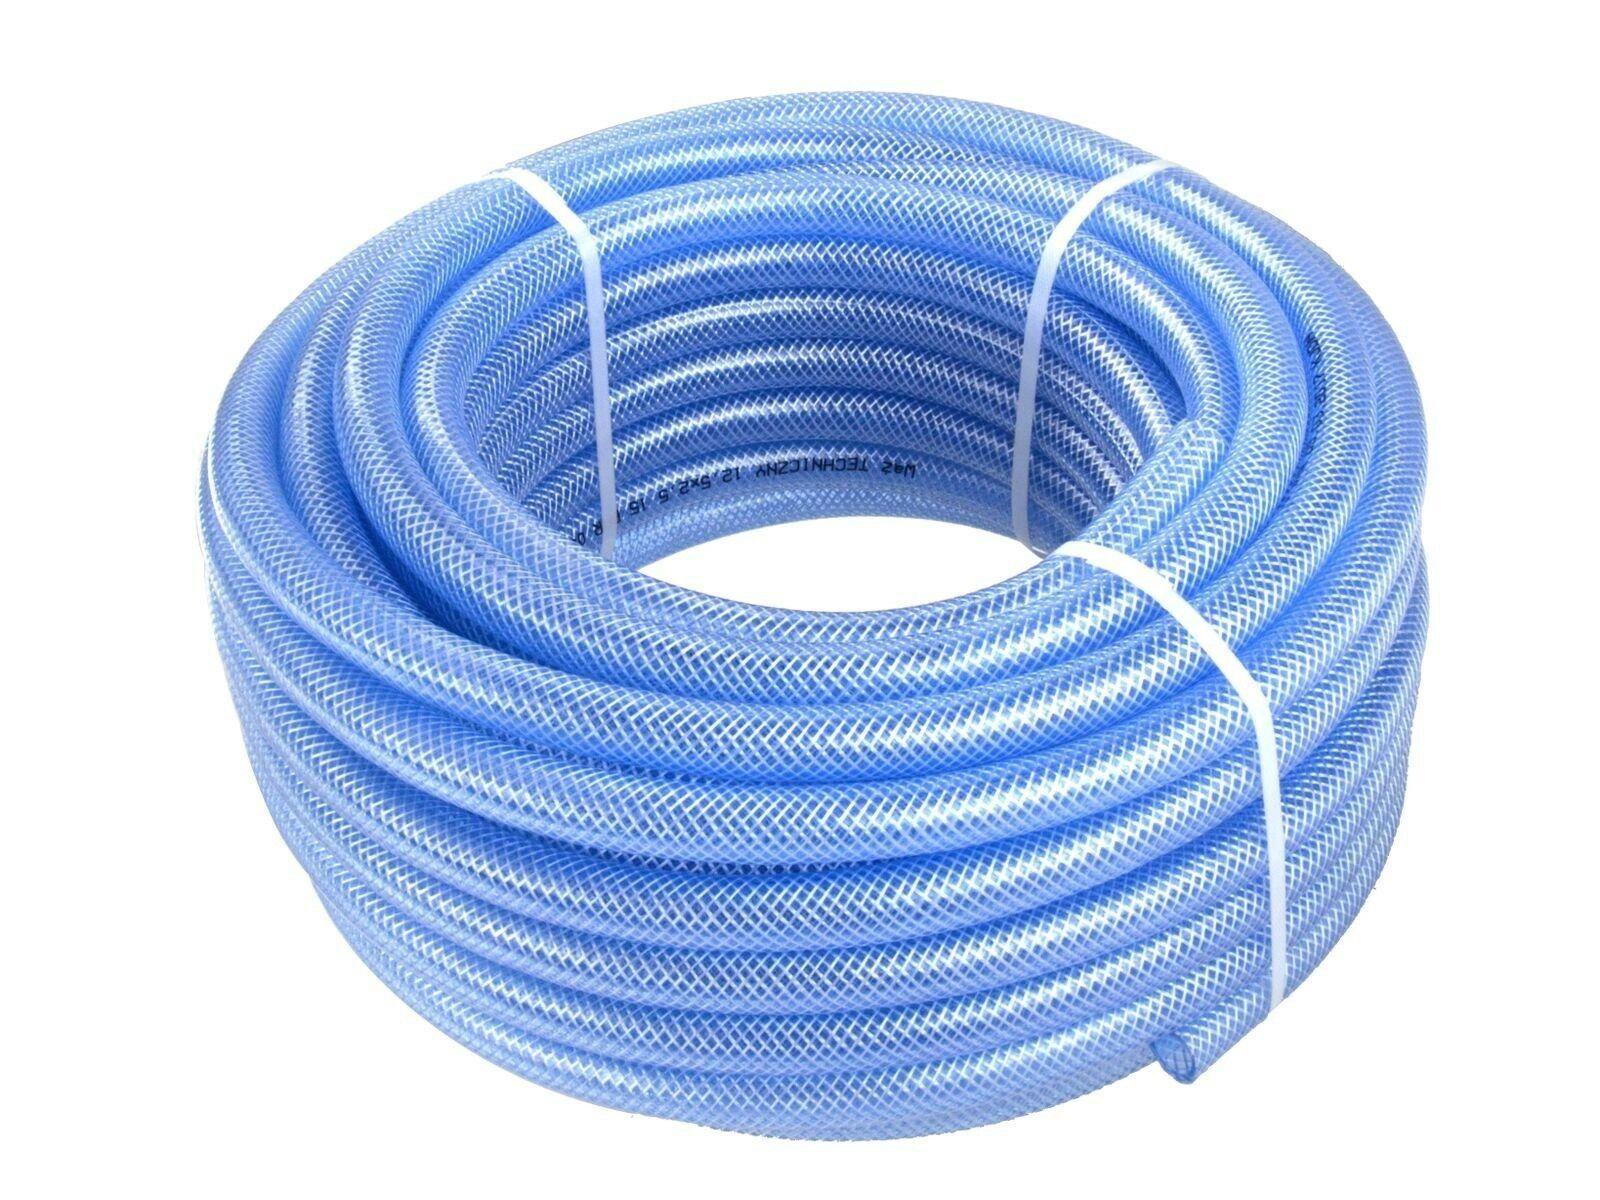 Hadice zesílená modrá, 19x3 mm, 50 m